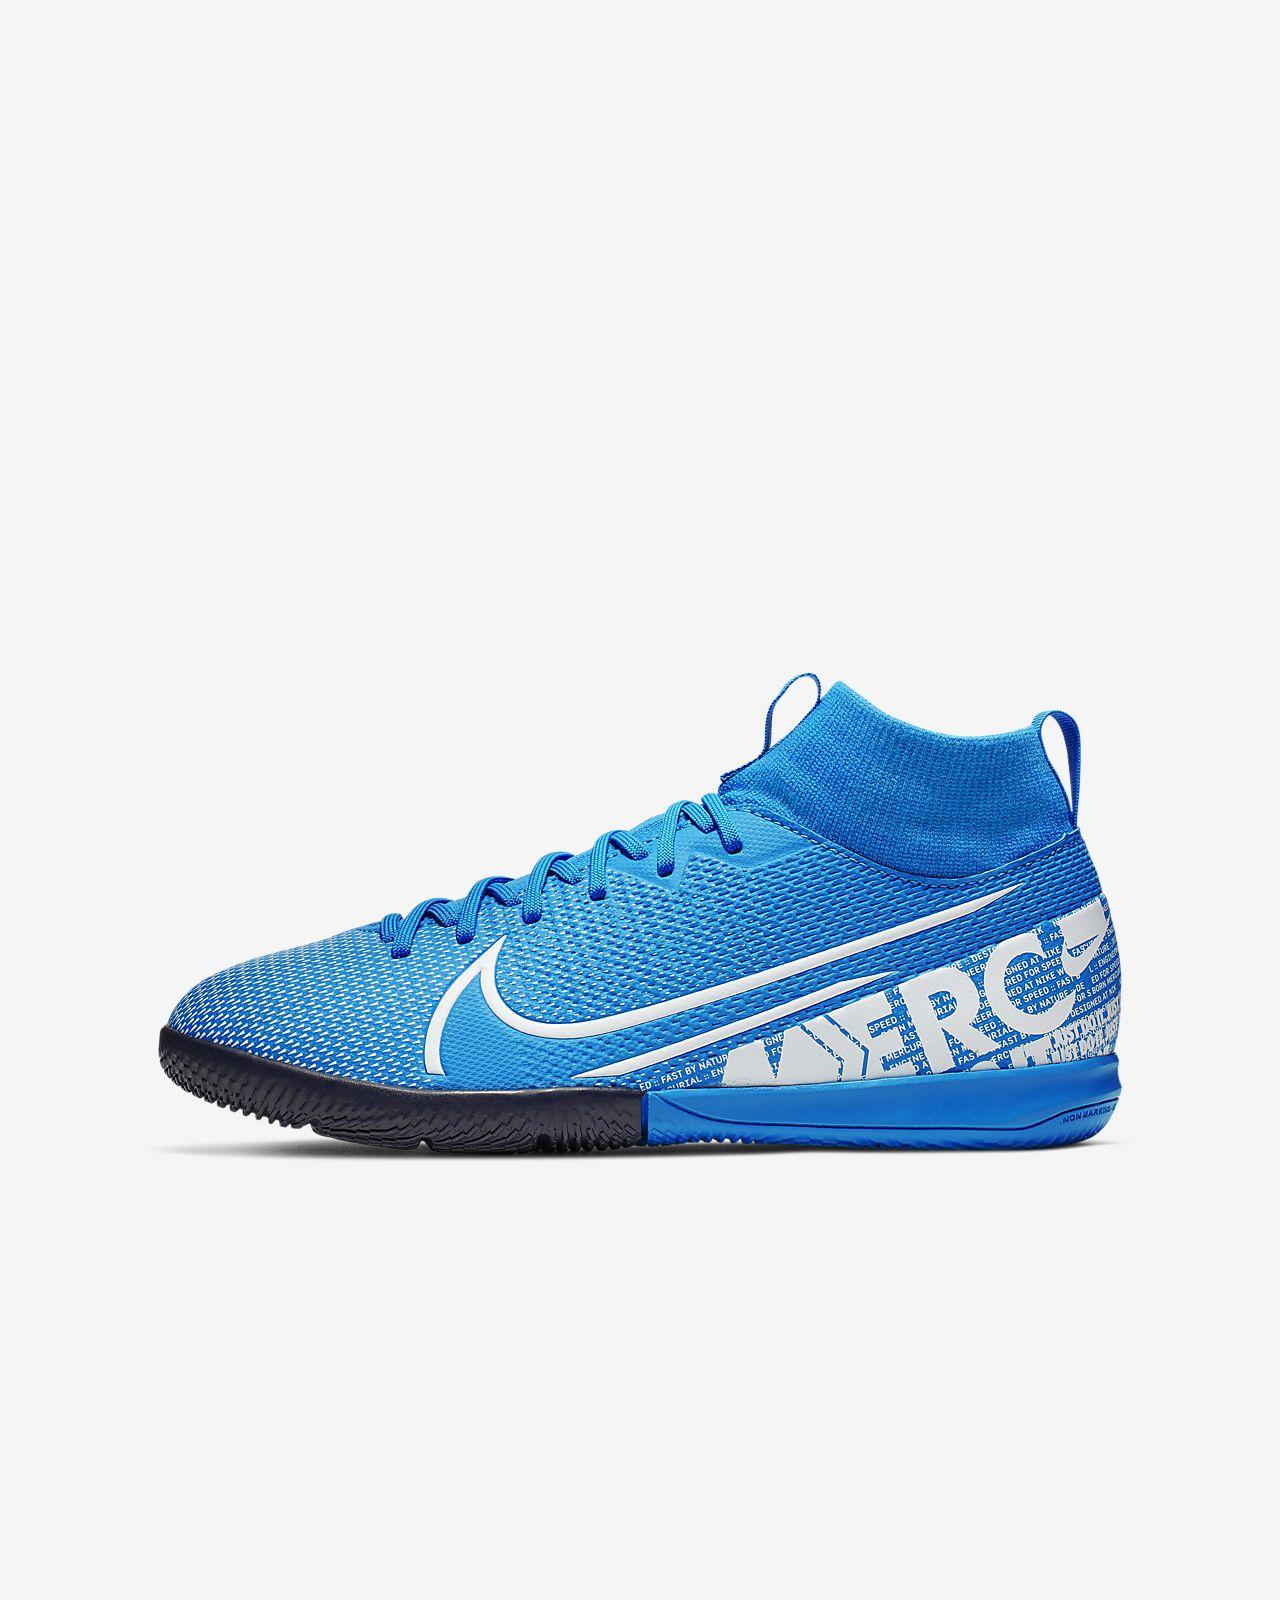 Scarpa da calcio per campi indoor Nike Jr. Mercurial Superfly 7 Academy IC - Bambini